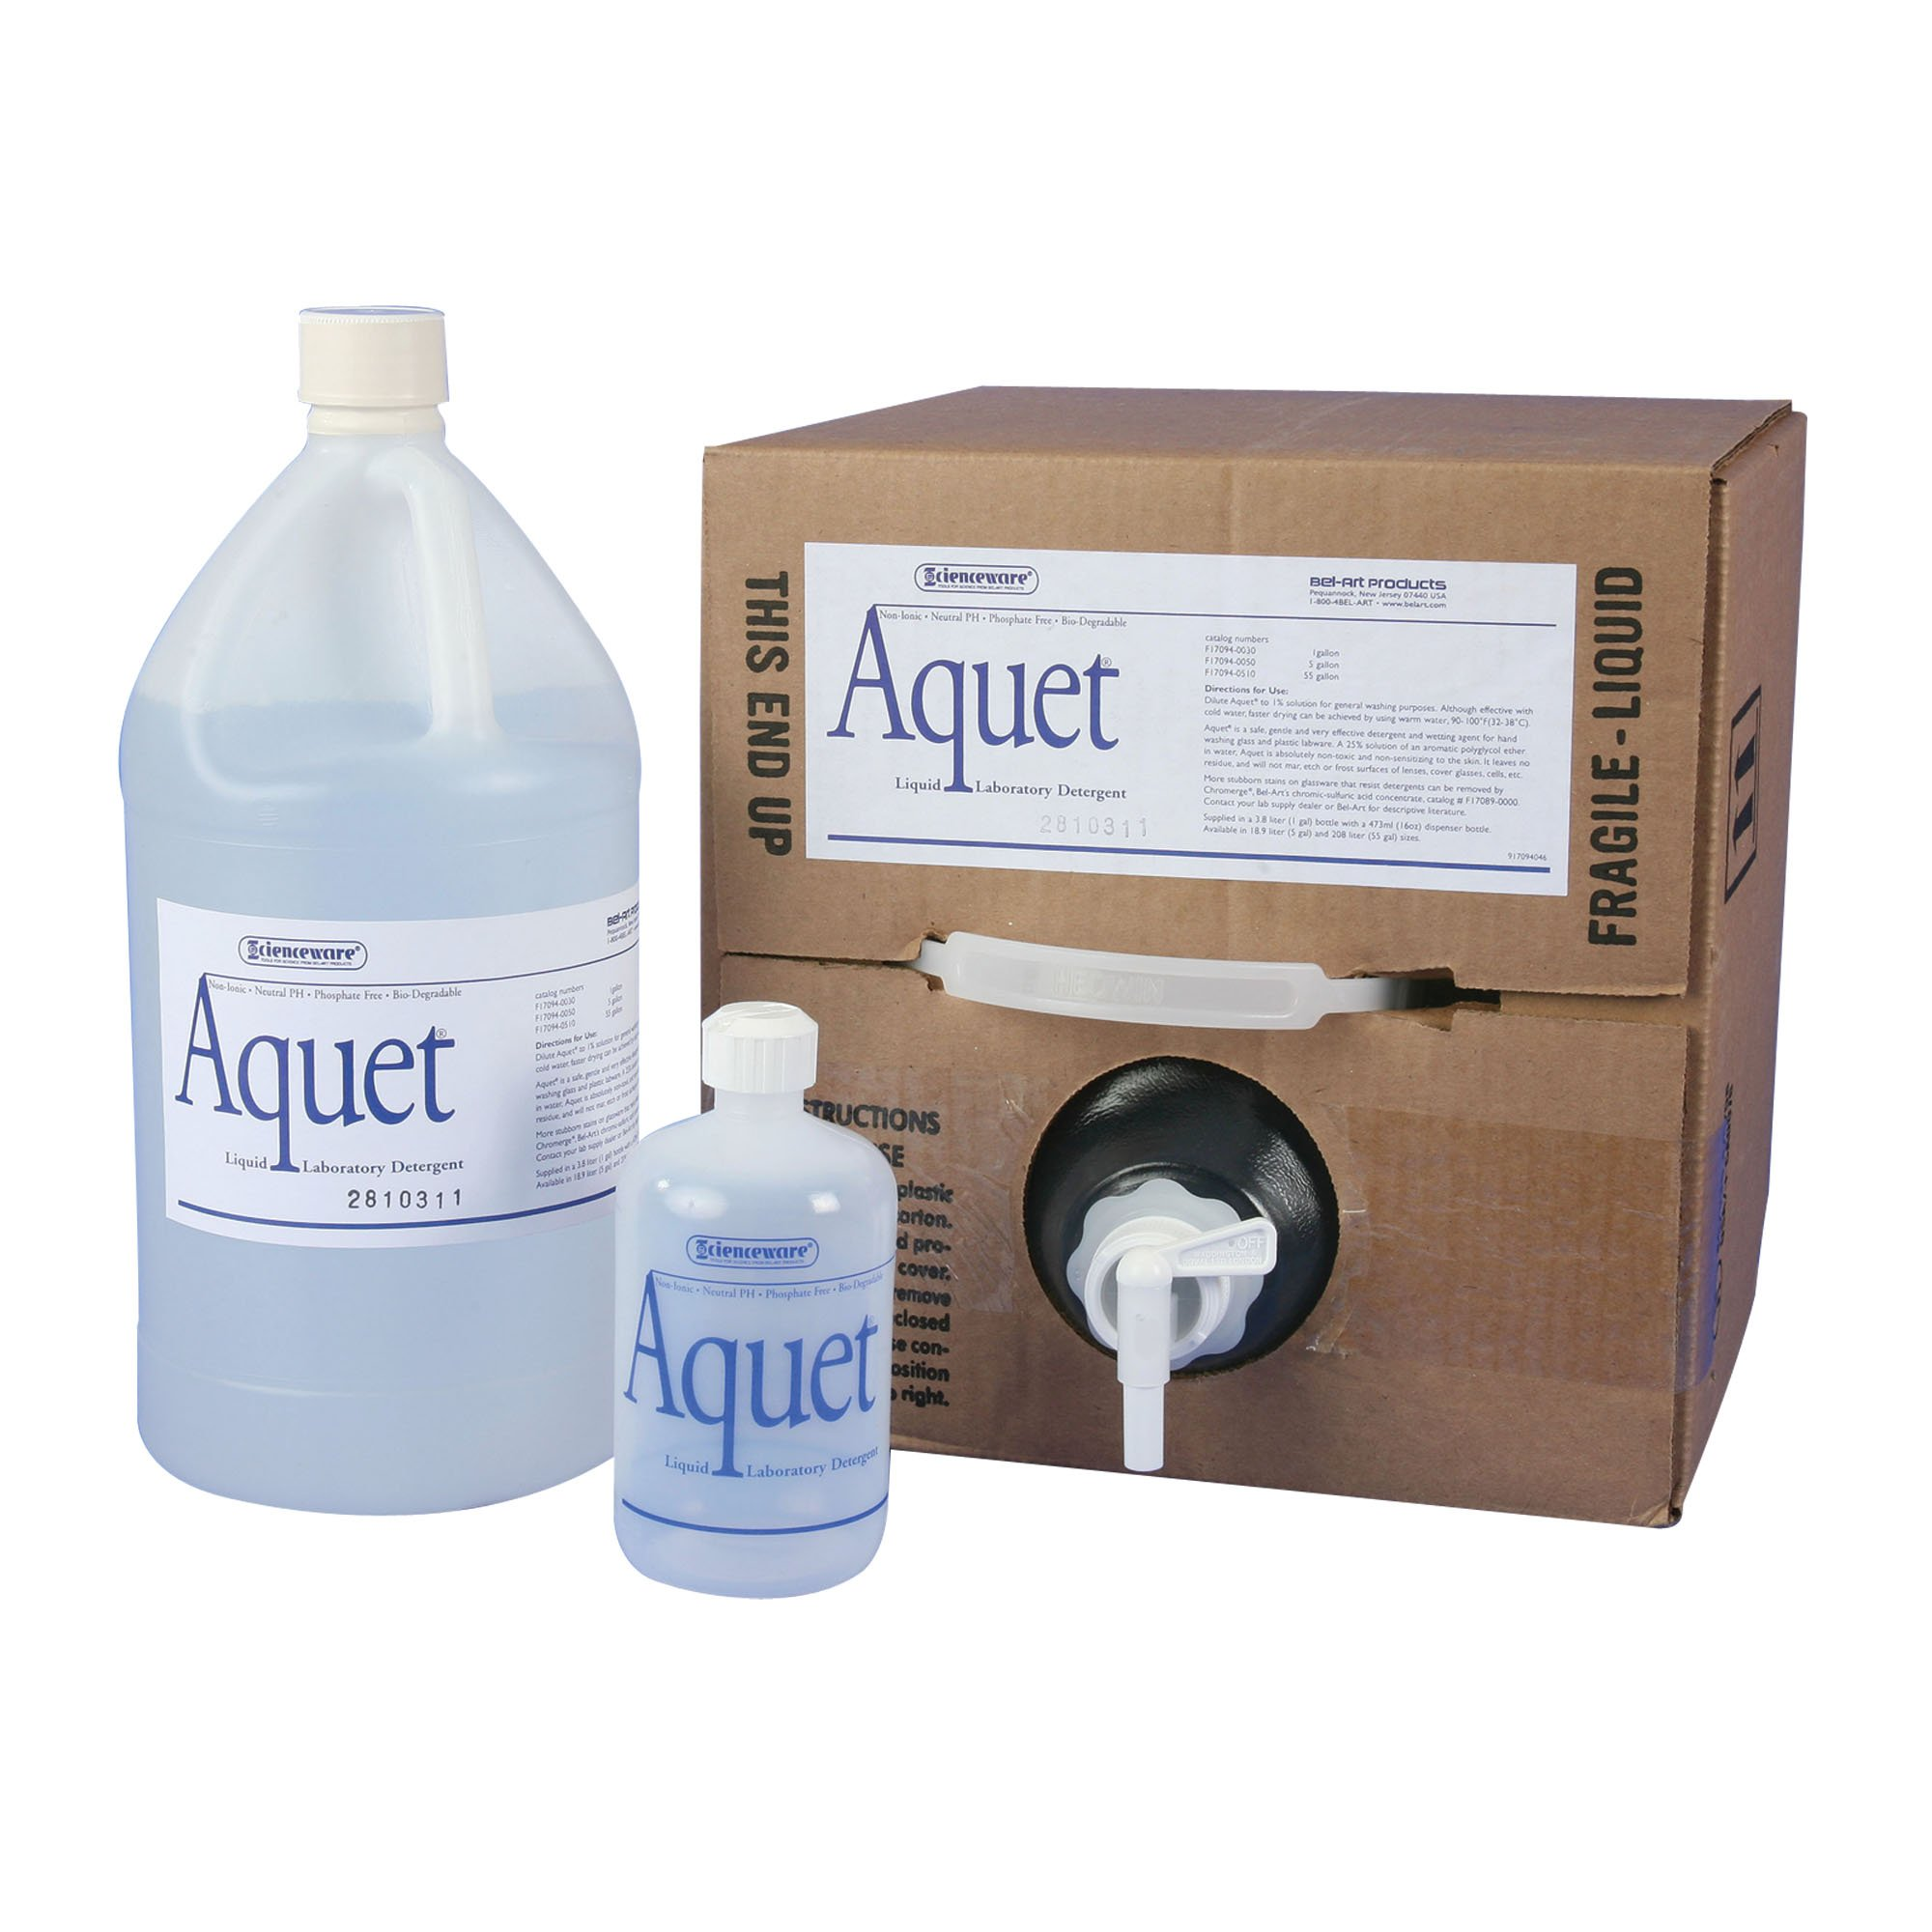 Bel-Art F17094-0050 Aquet Detergent for Glassware and Plastics; 20 Liter Cubitainer by SP Scienceware